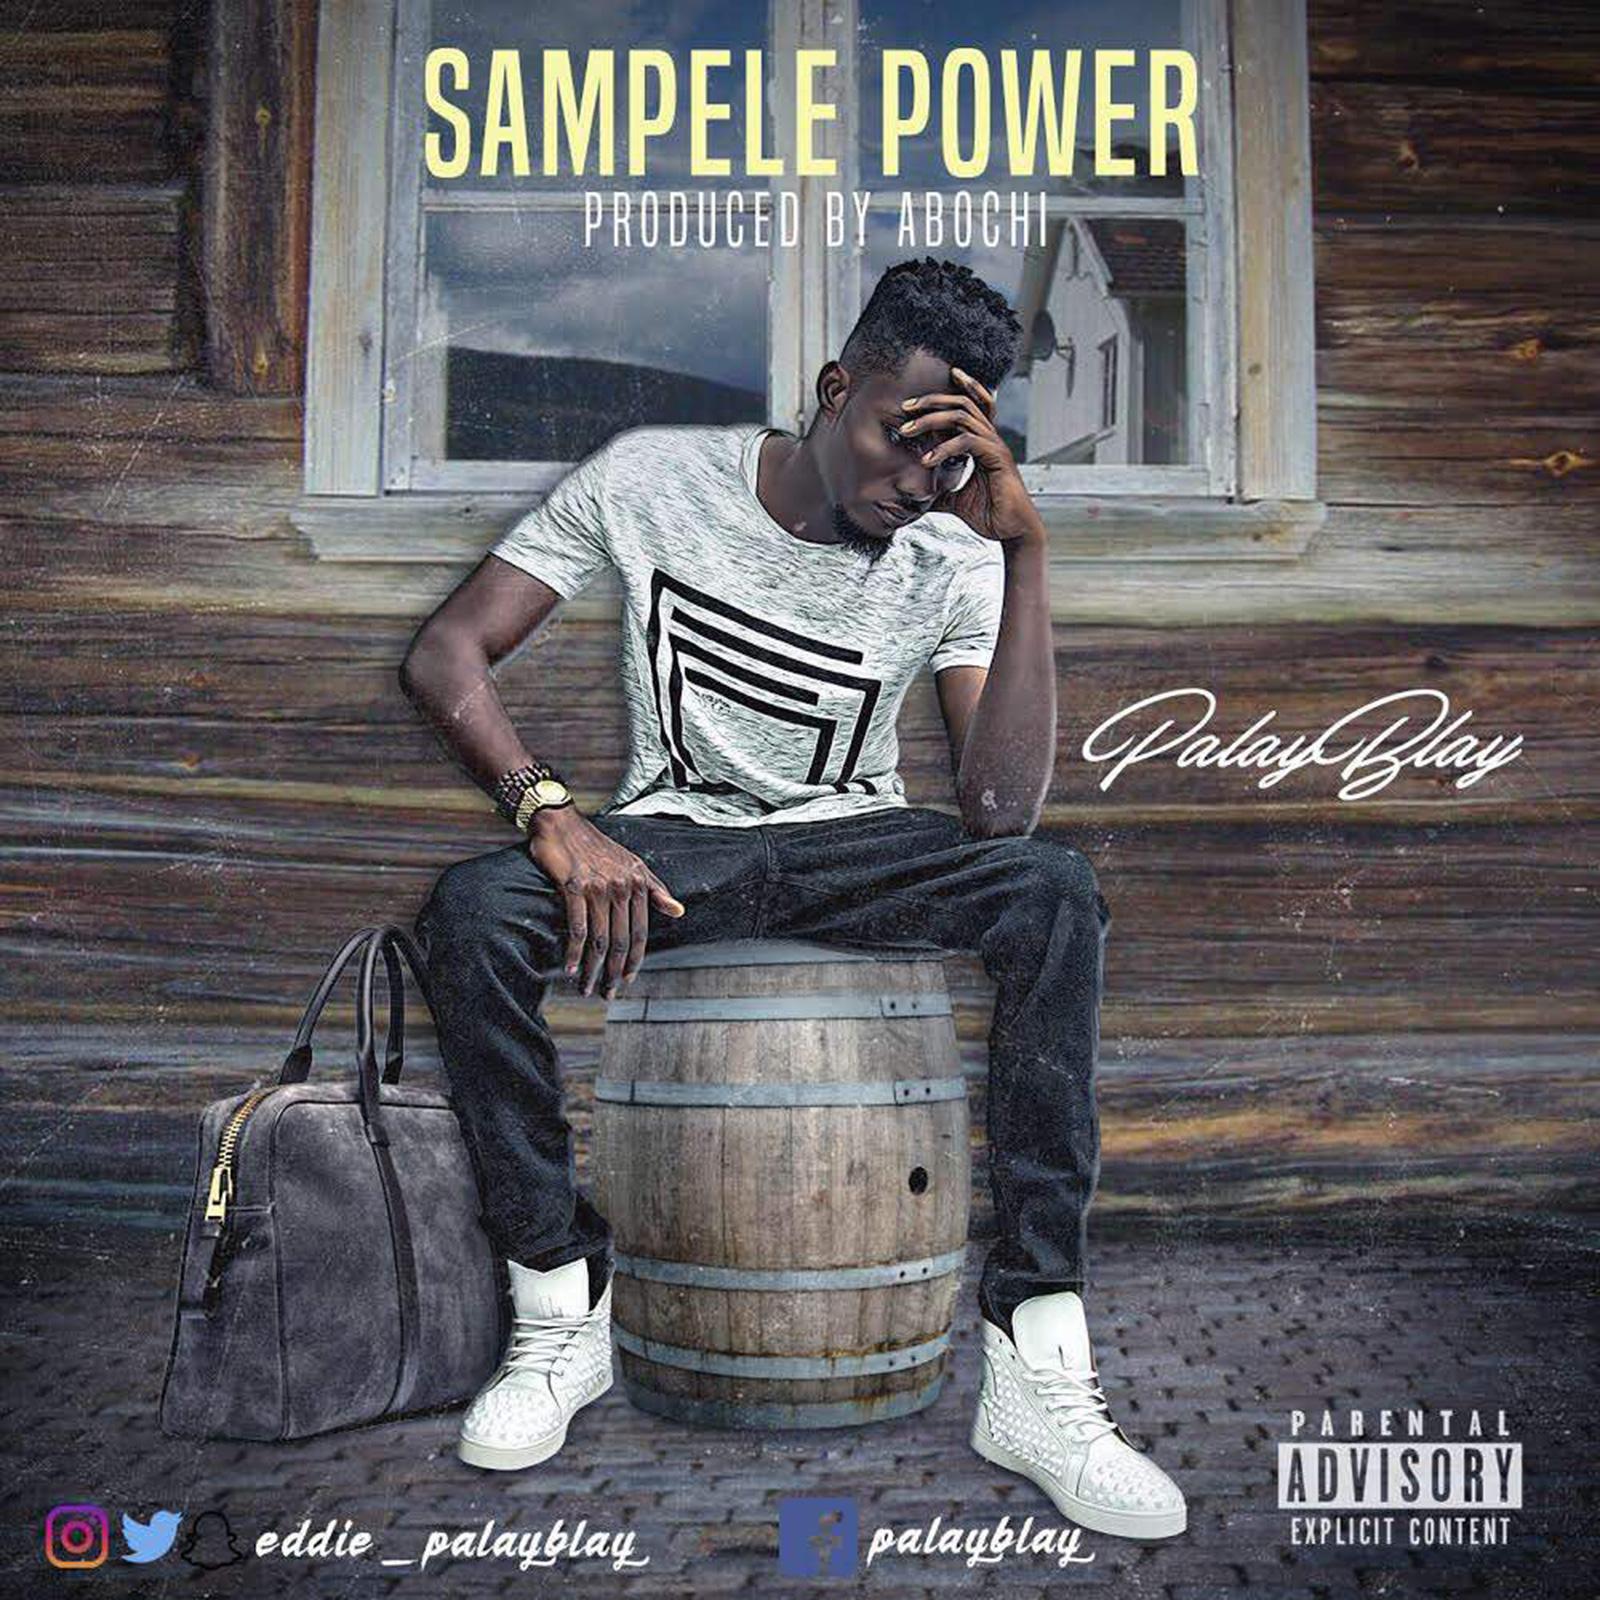 Palayblay by Sampele Power